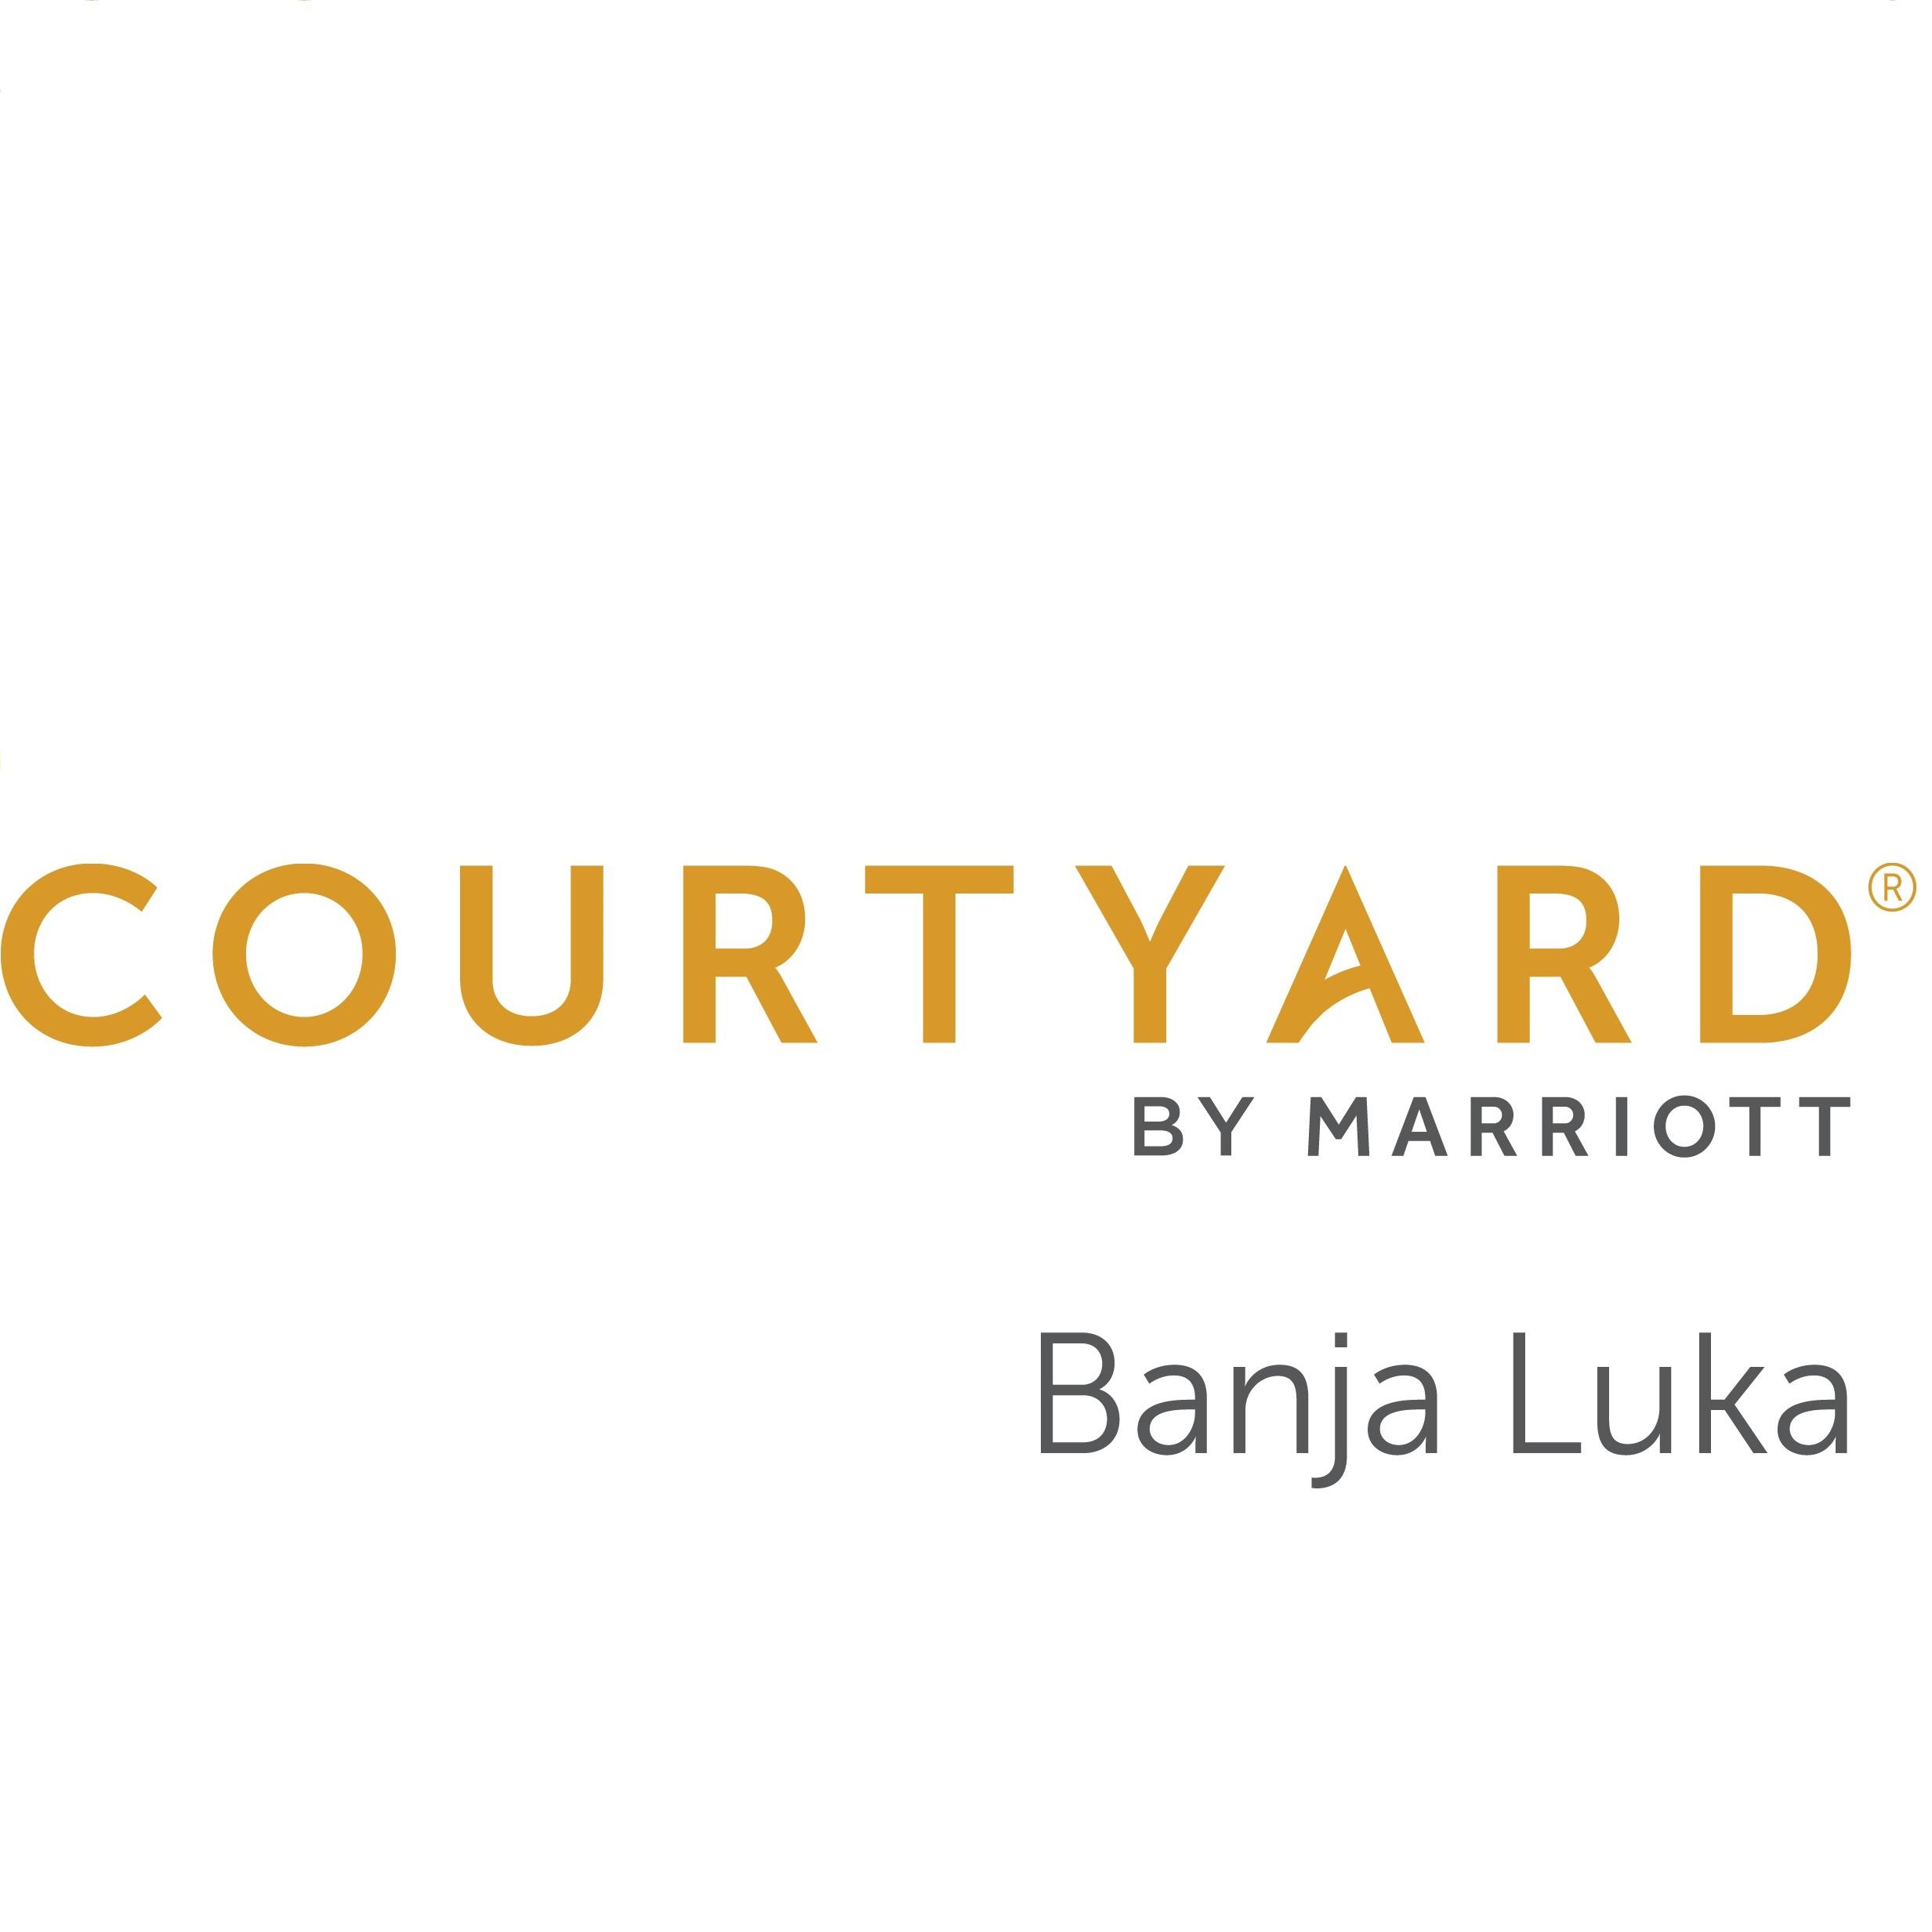 Courtyard by Marriott Banja Luka